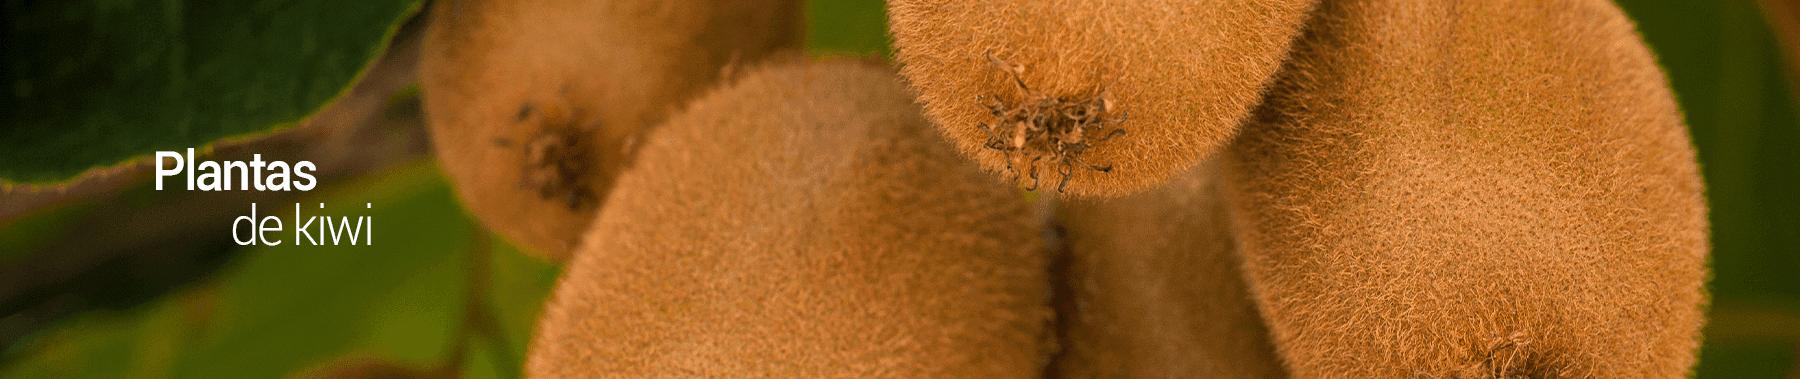 kiwi-los-vinedos-PERU-1